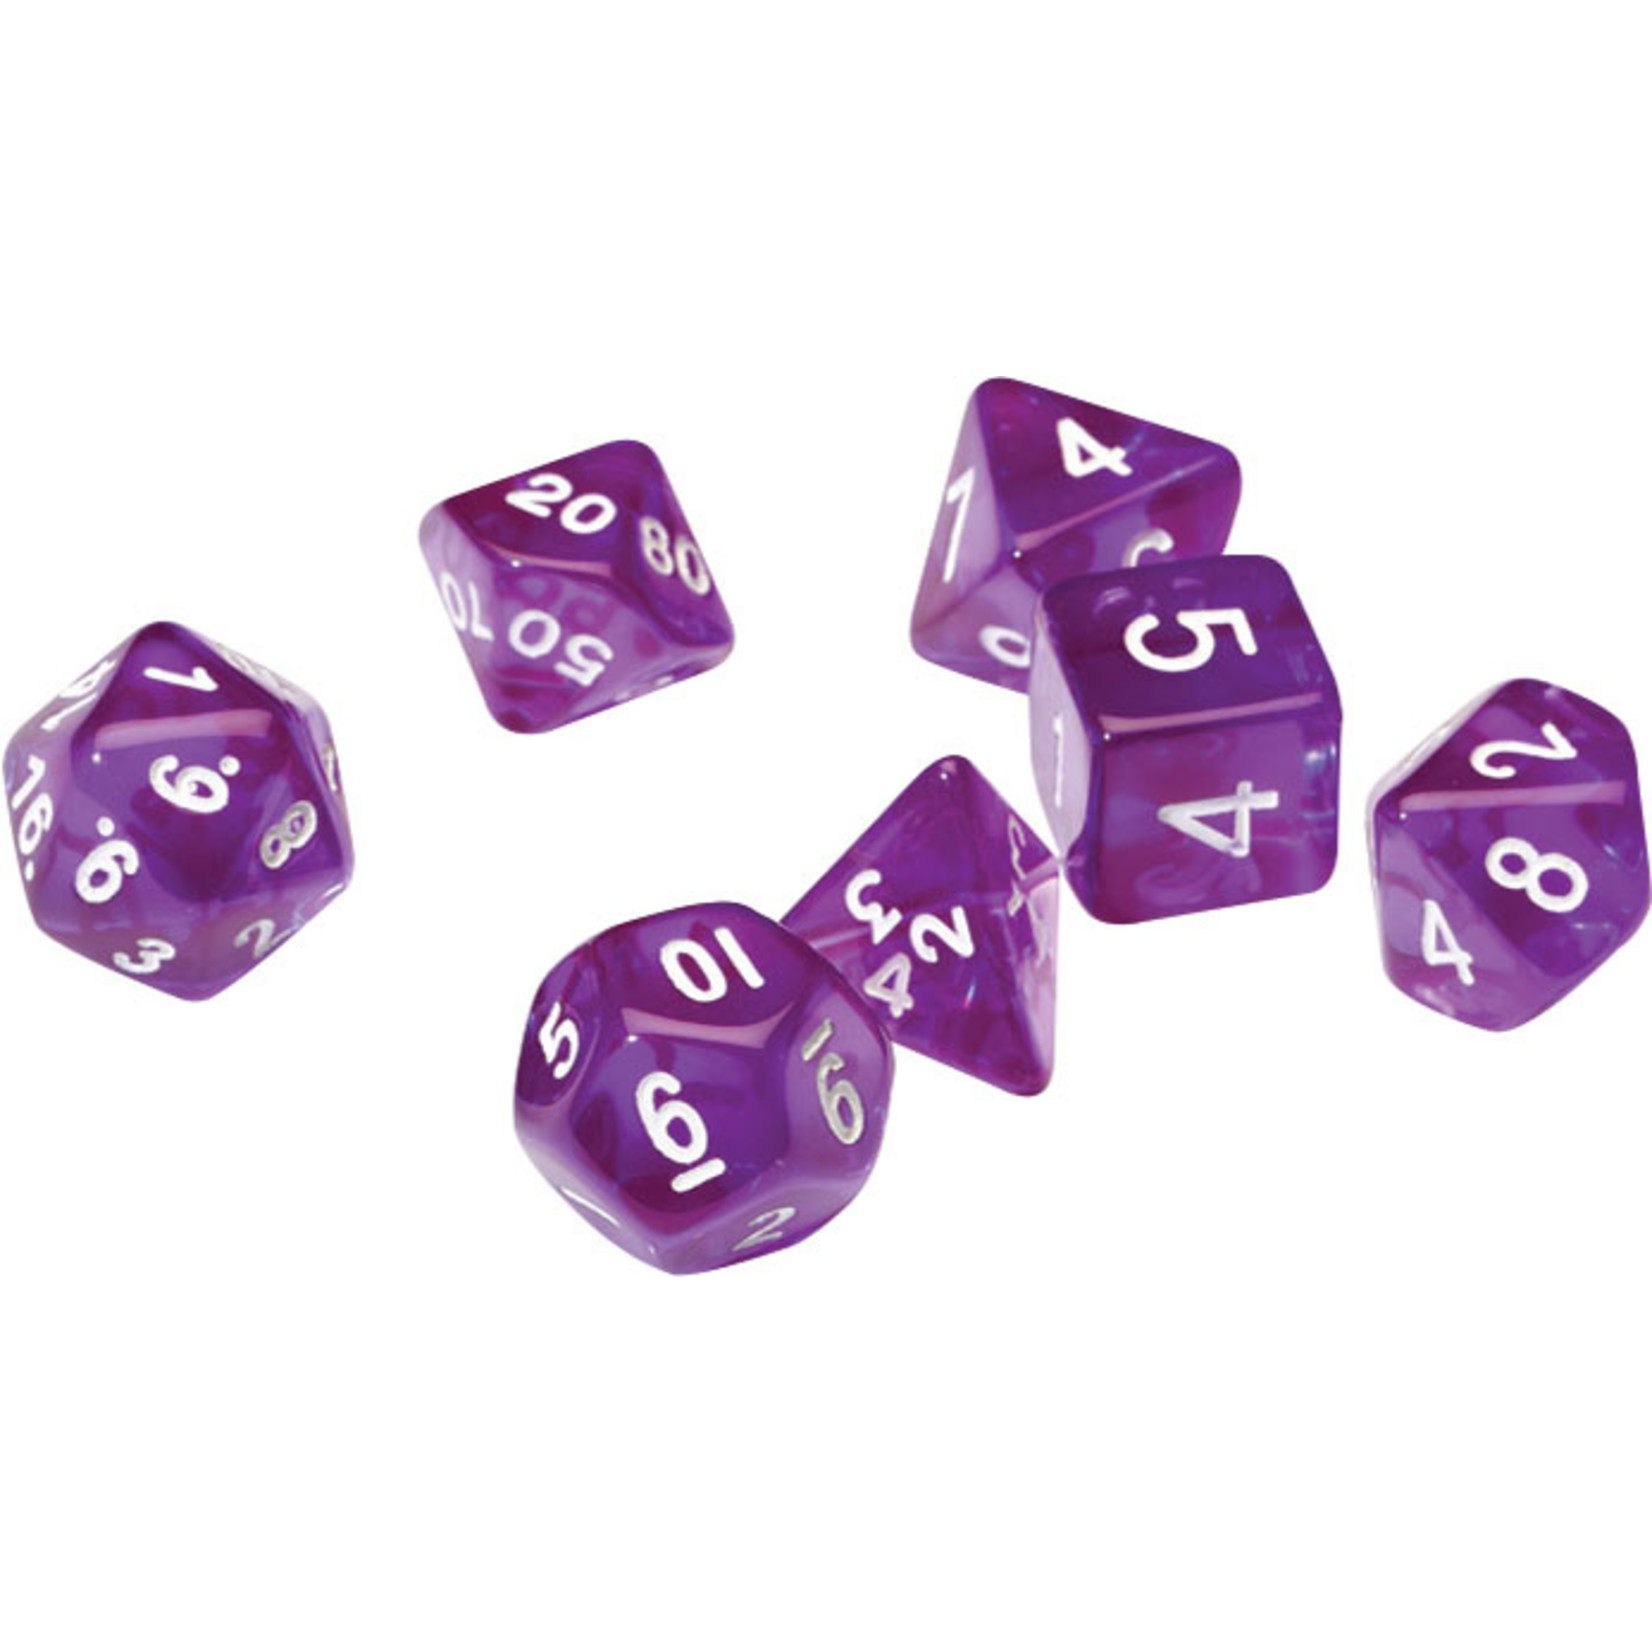 RPG Dice Set (7): Translucent Purple Resin